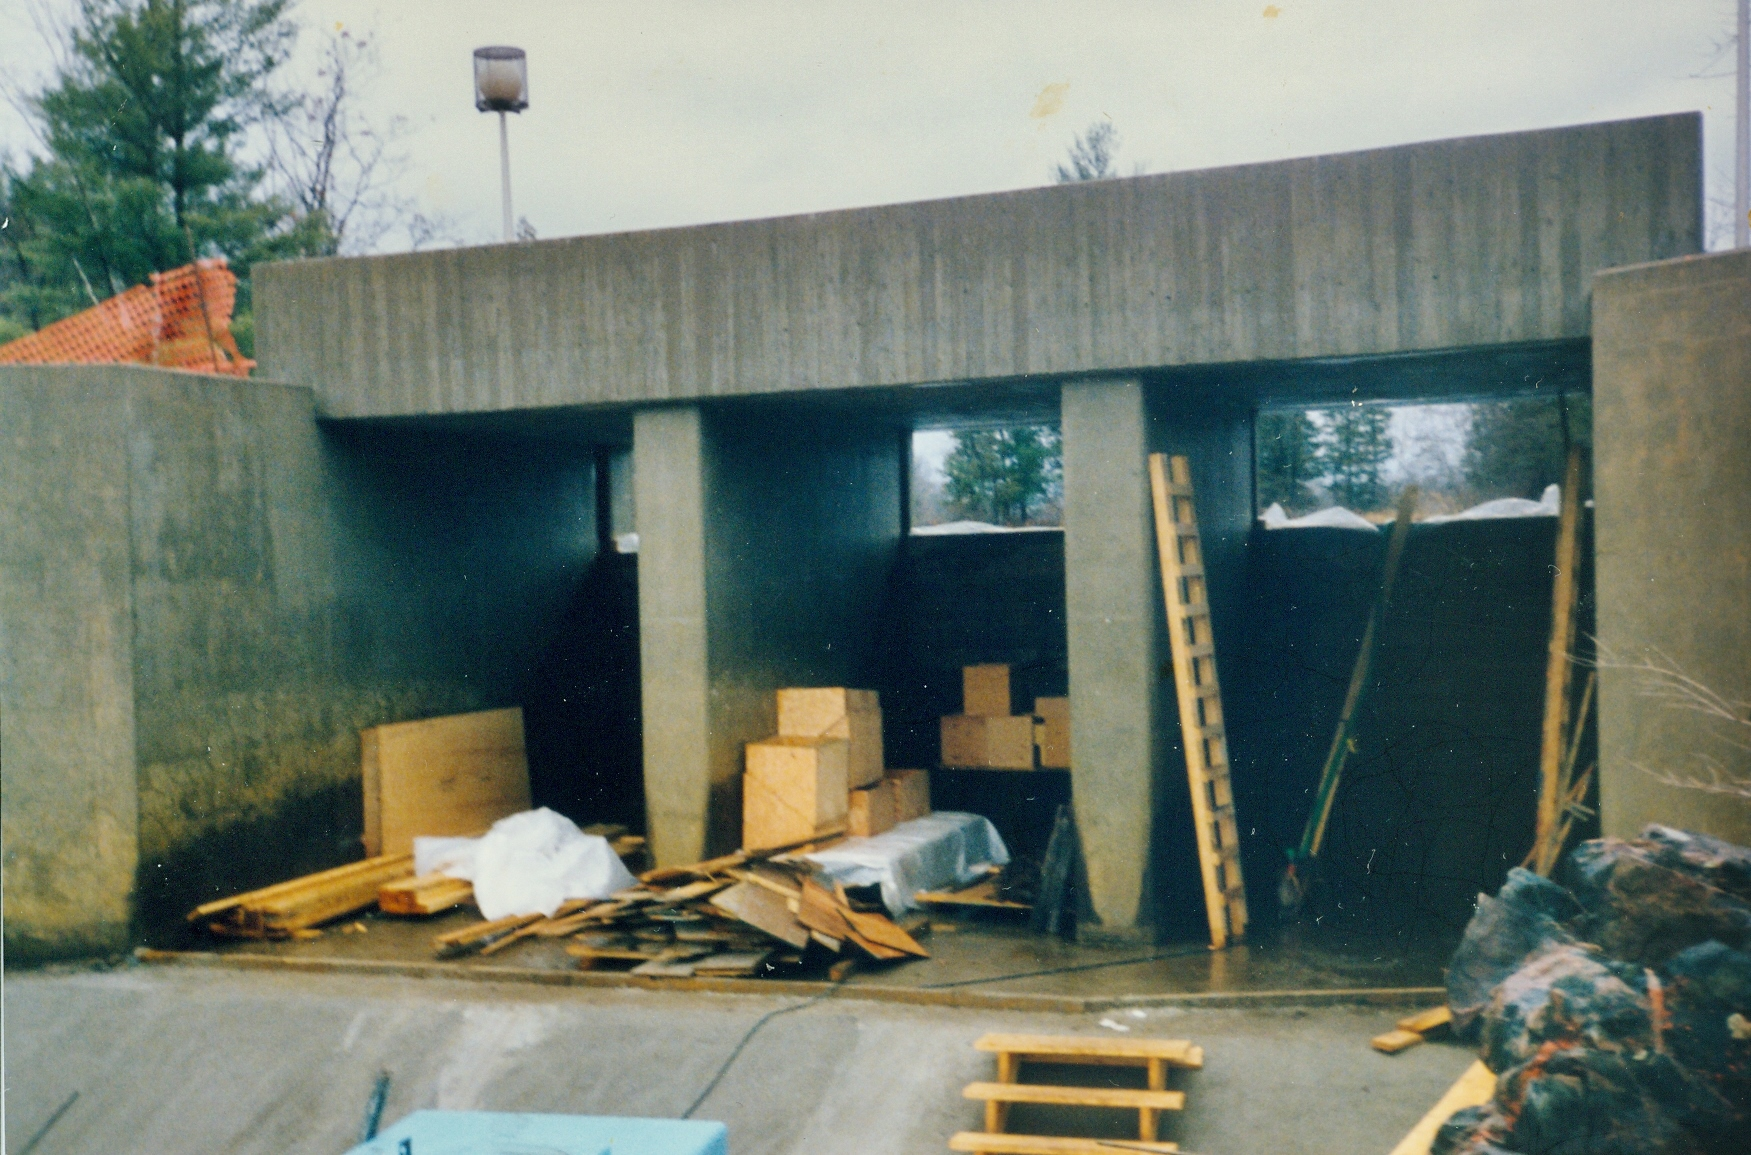 1991 repairs to Marmora Dam